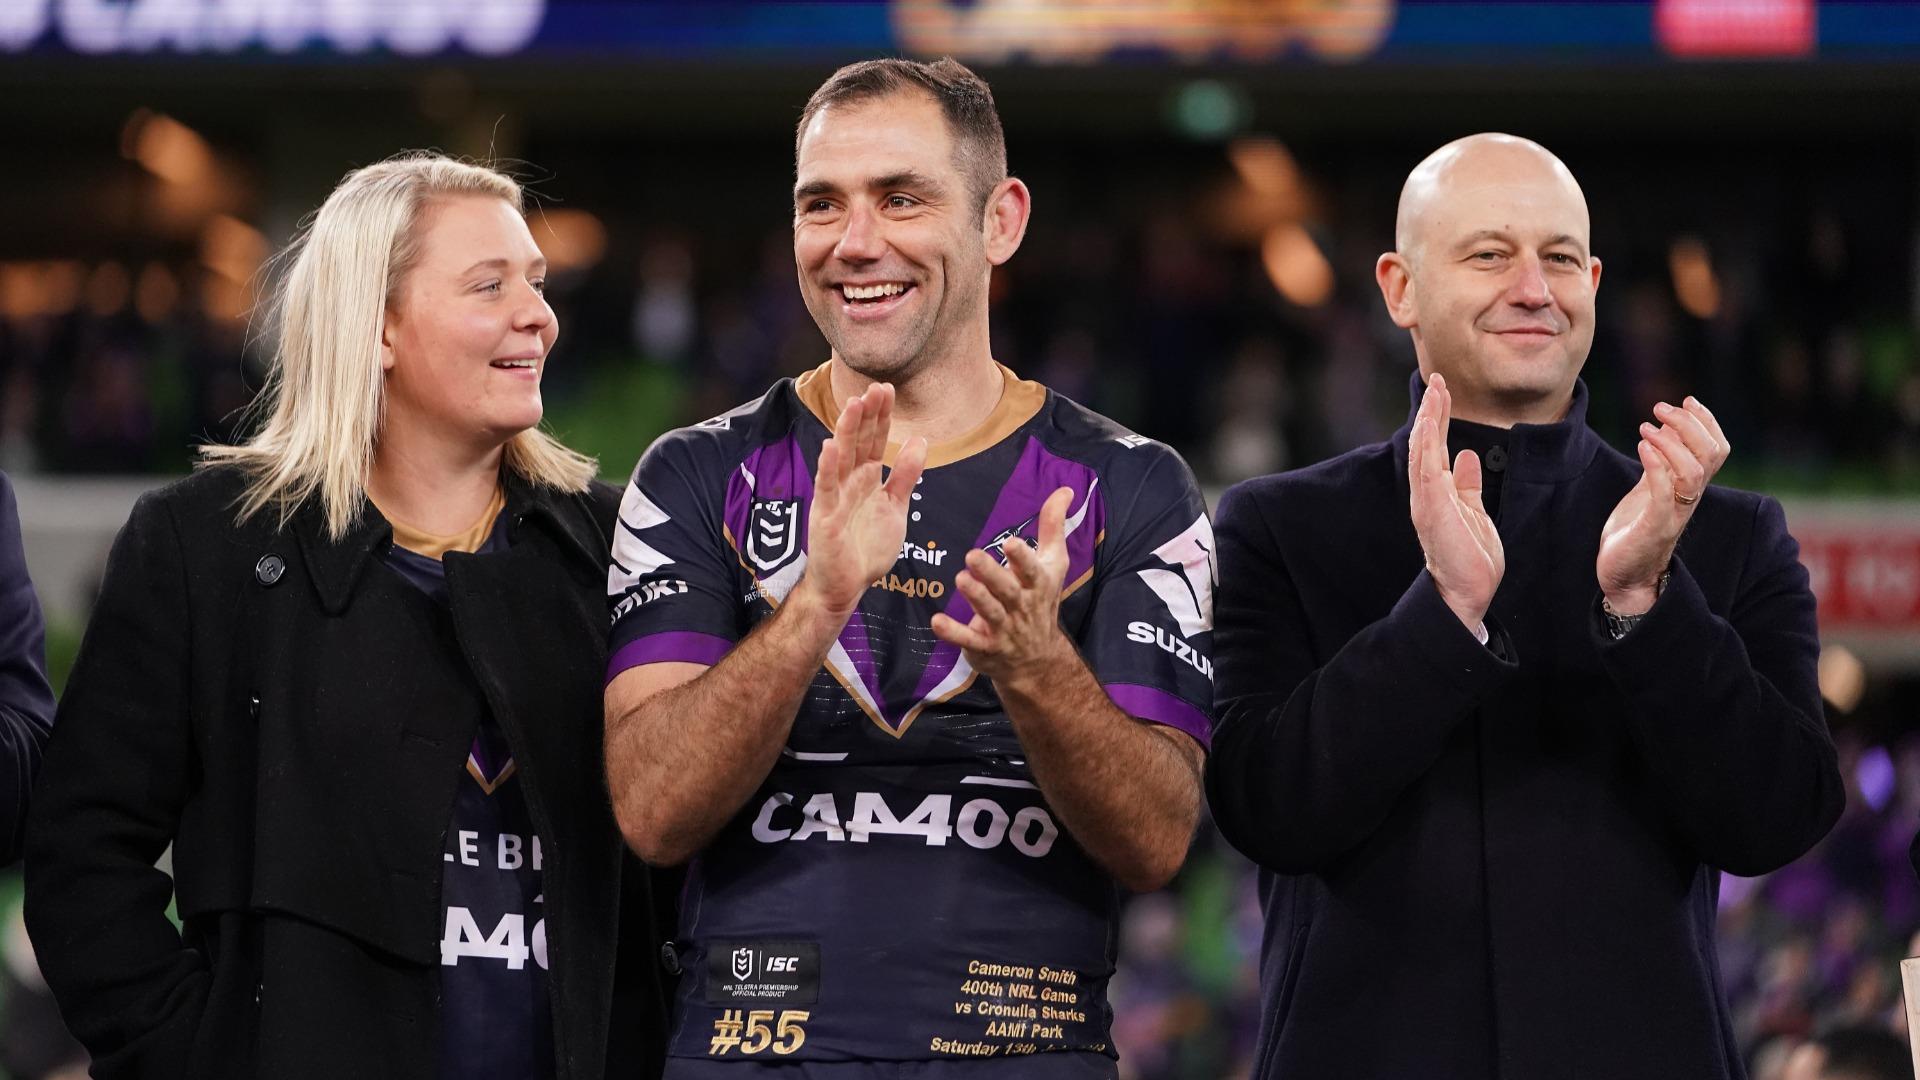 Bellamy honoured to coach 'icon of Australian sport' Smith